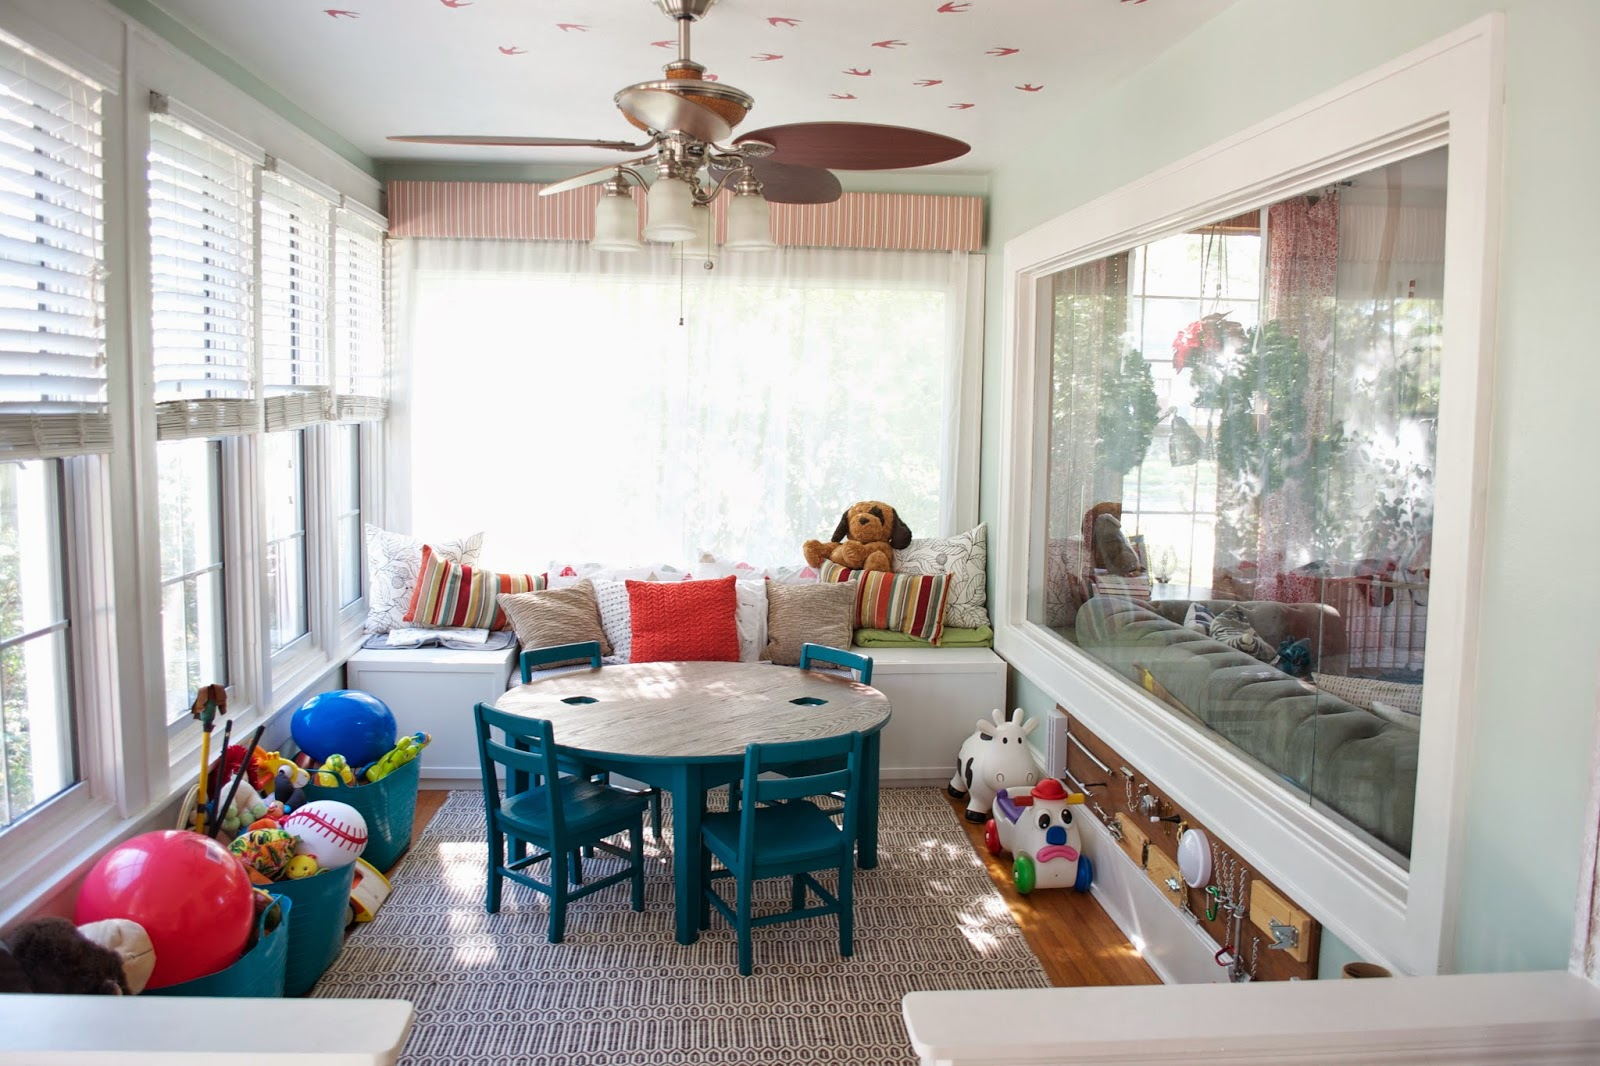 CK And Nate Header: Playroom Table